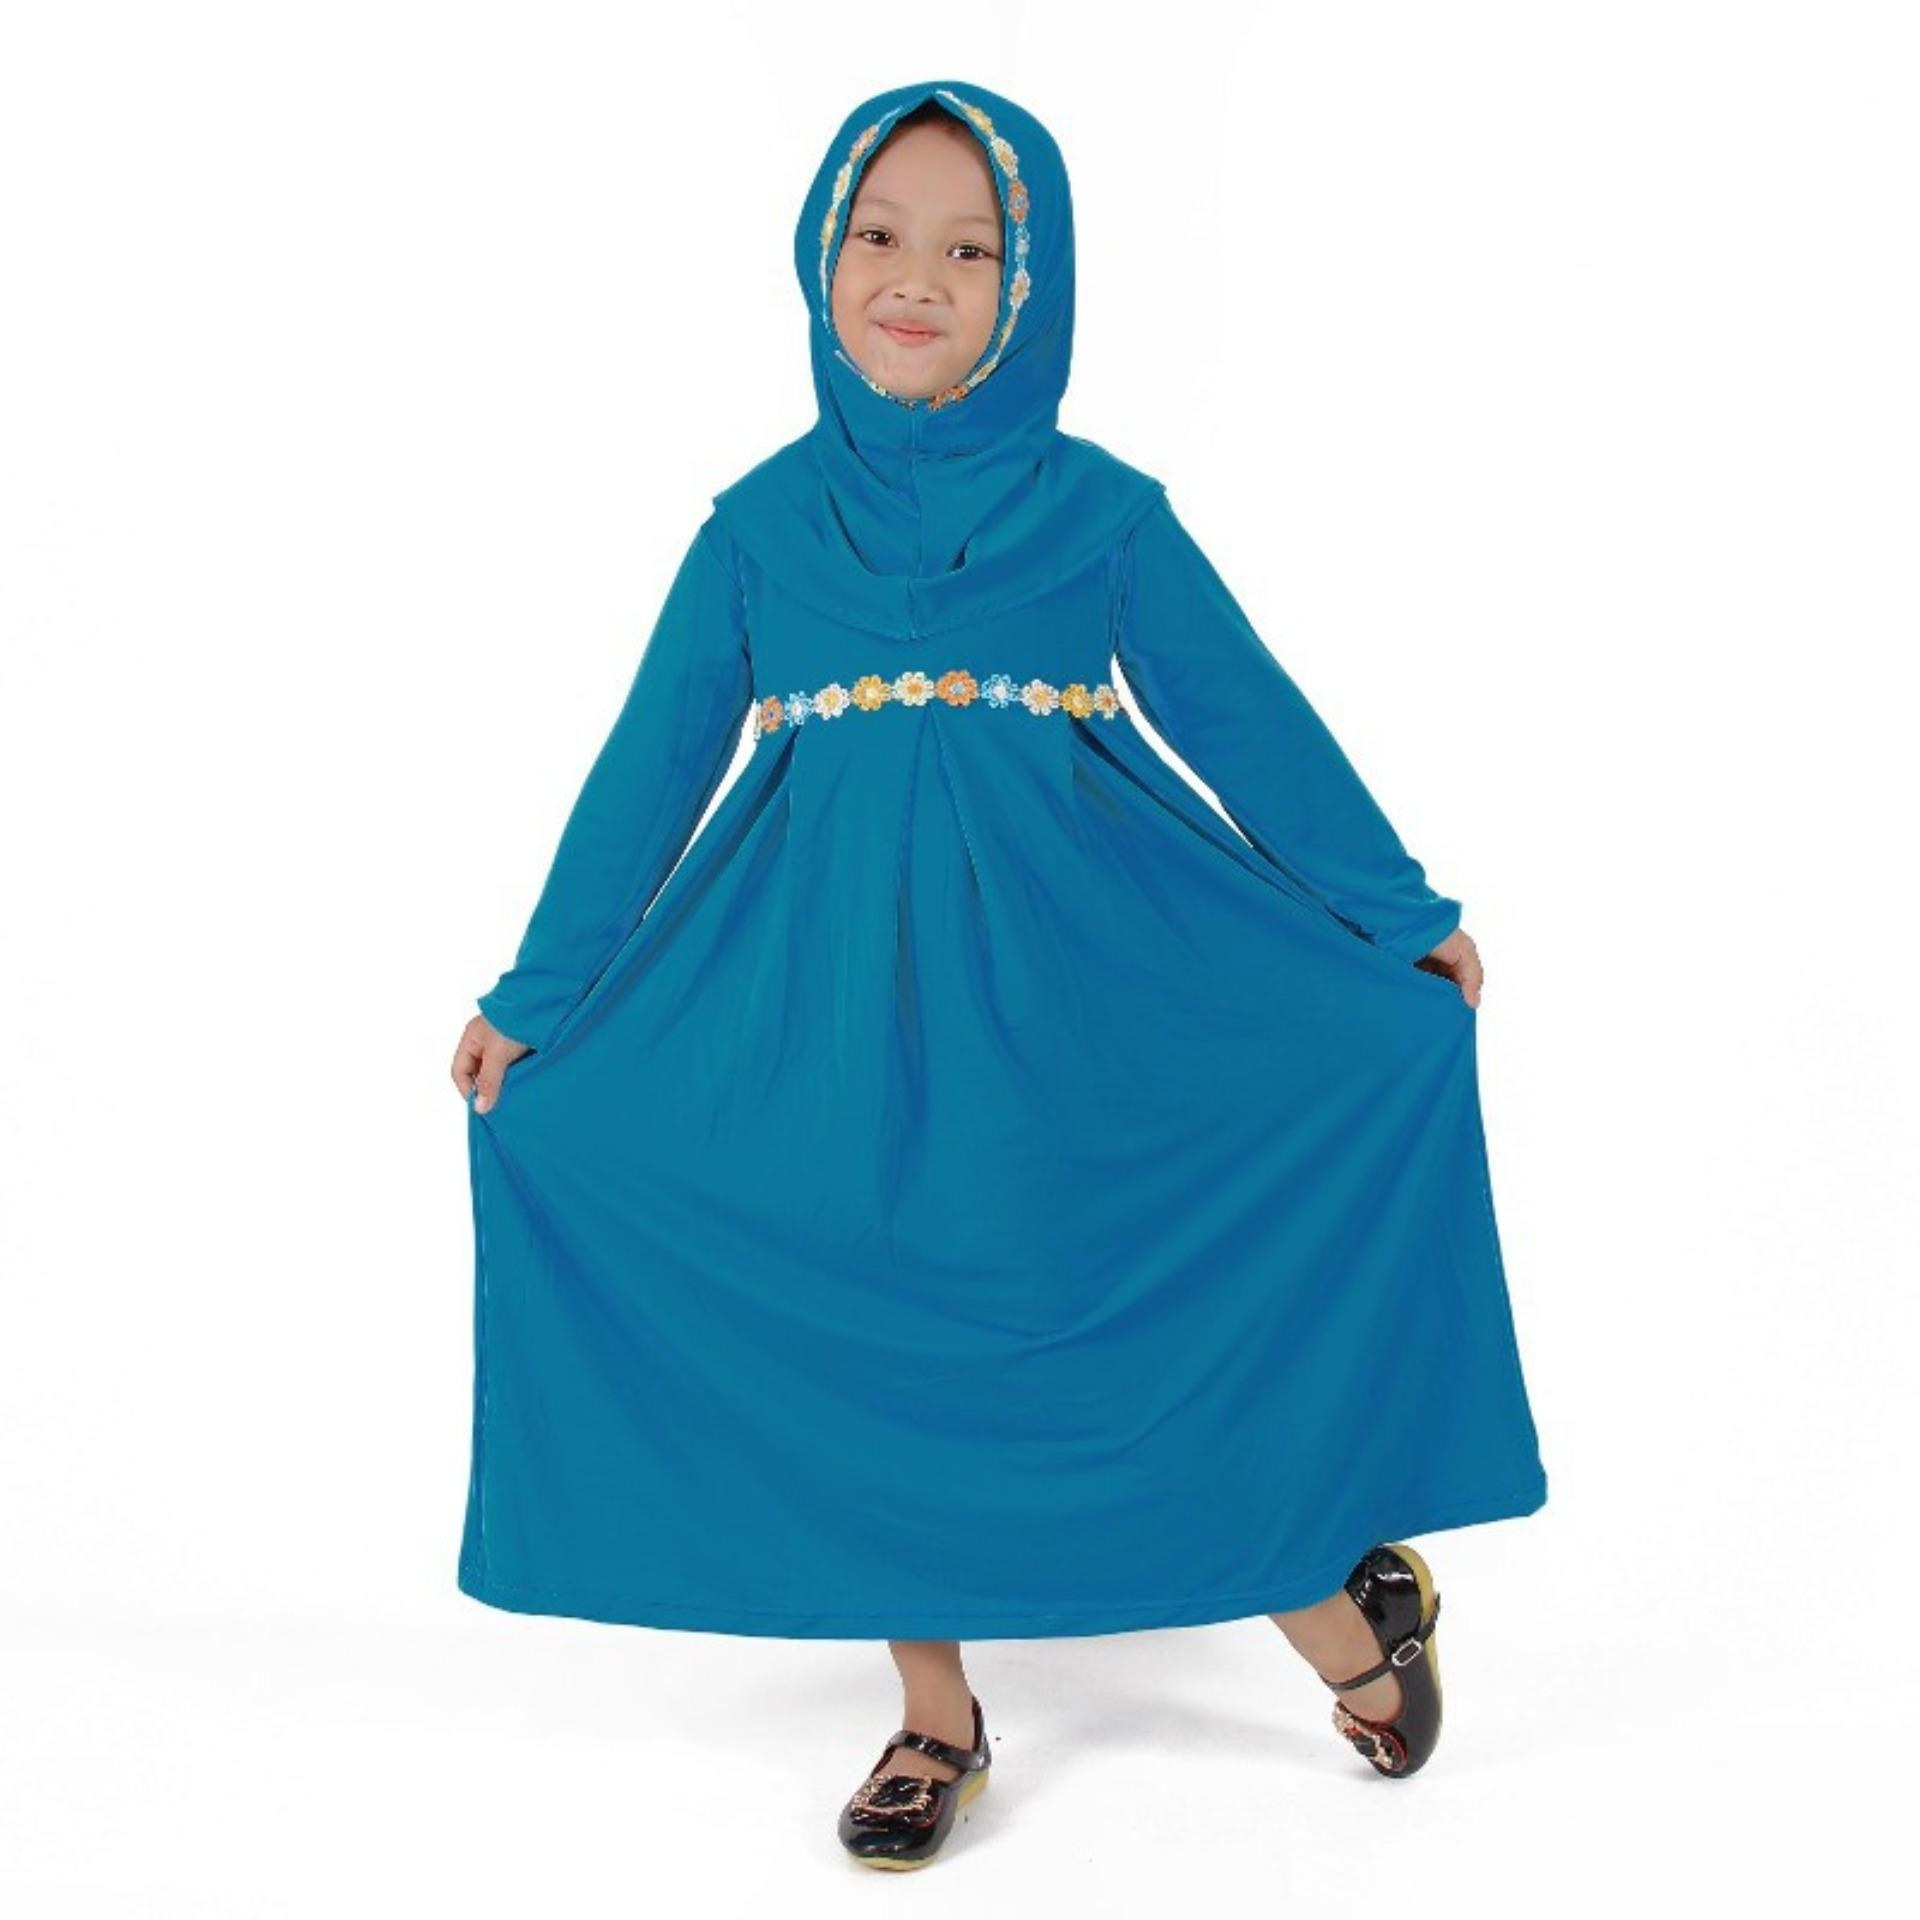 Model Baju Lebaran Gokil 0gdr Galeri Gambar Lucu Baju Lebaran